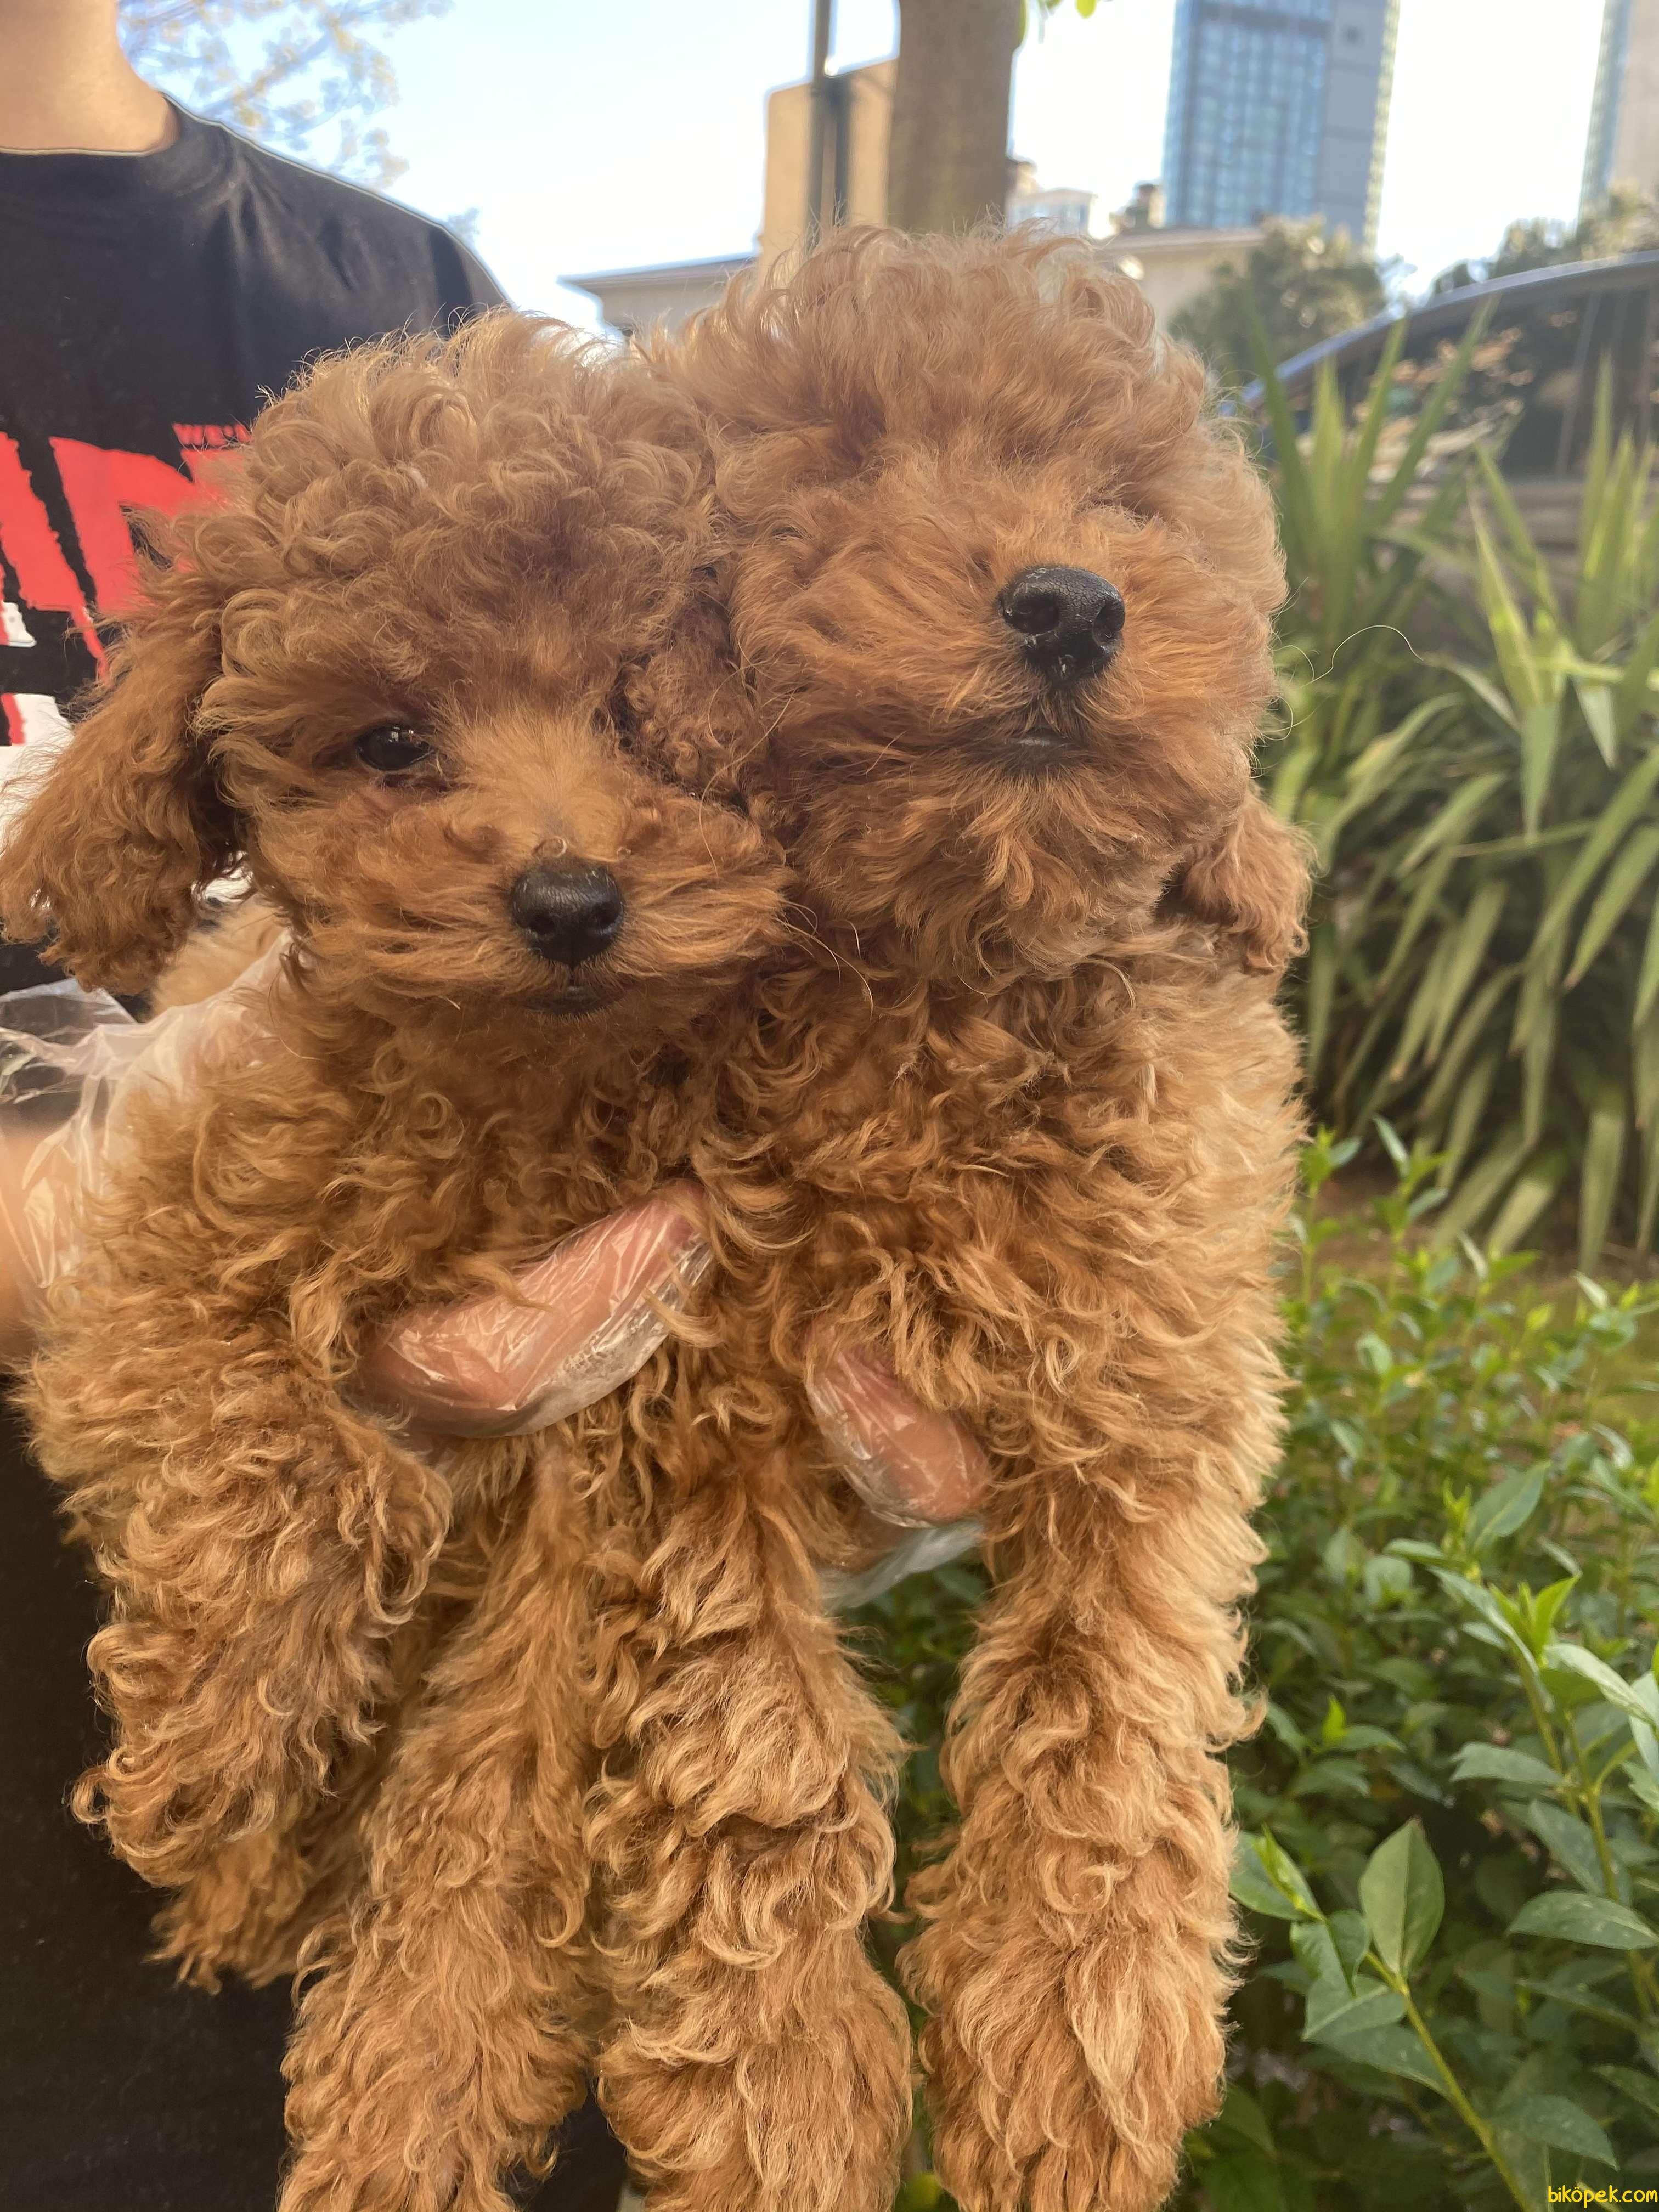 Redbrown Toy Poodle Gerçek Safkan Orjinal Garantli 4